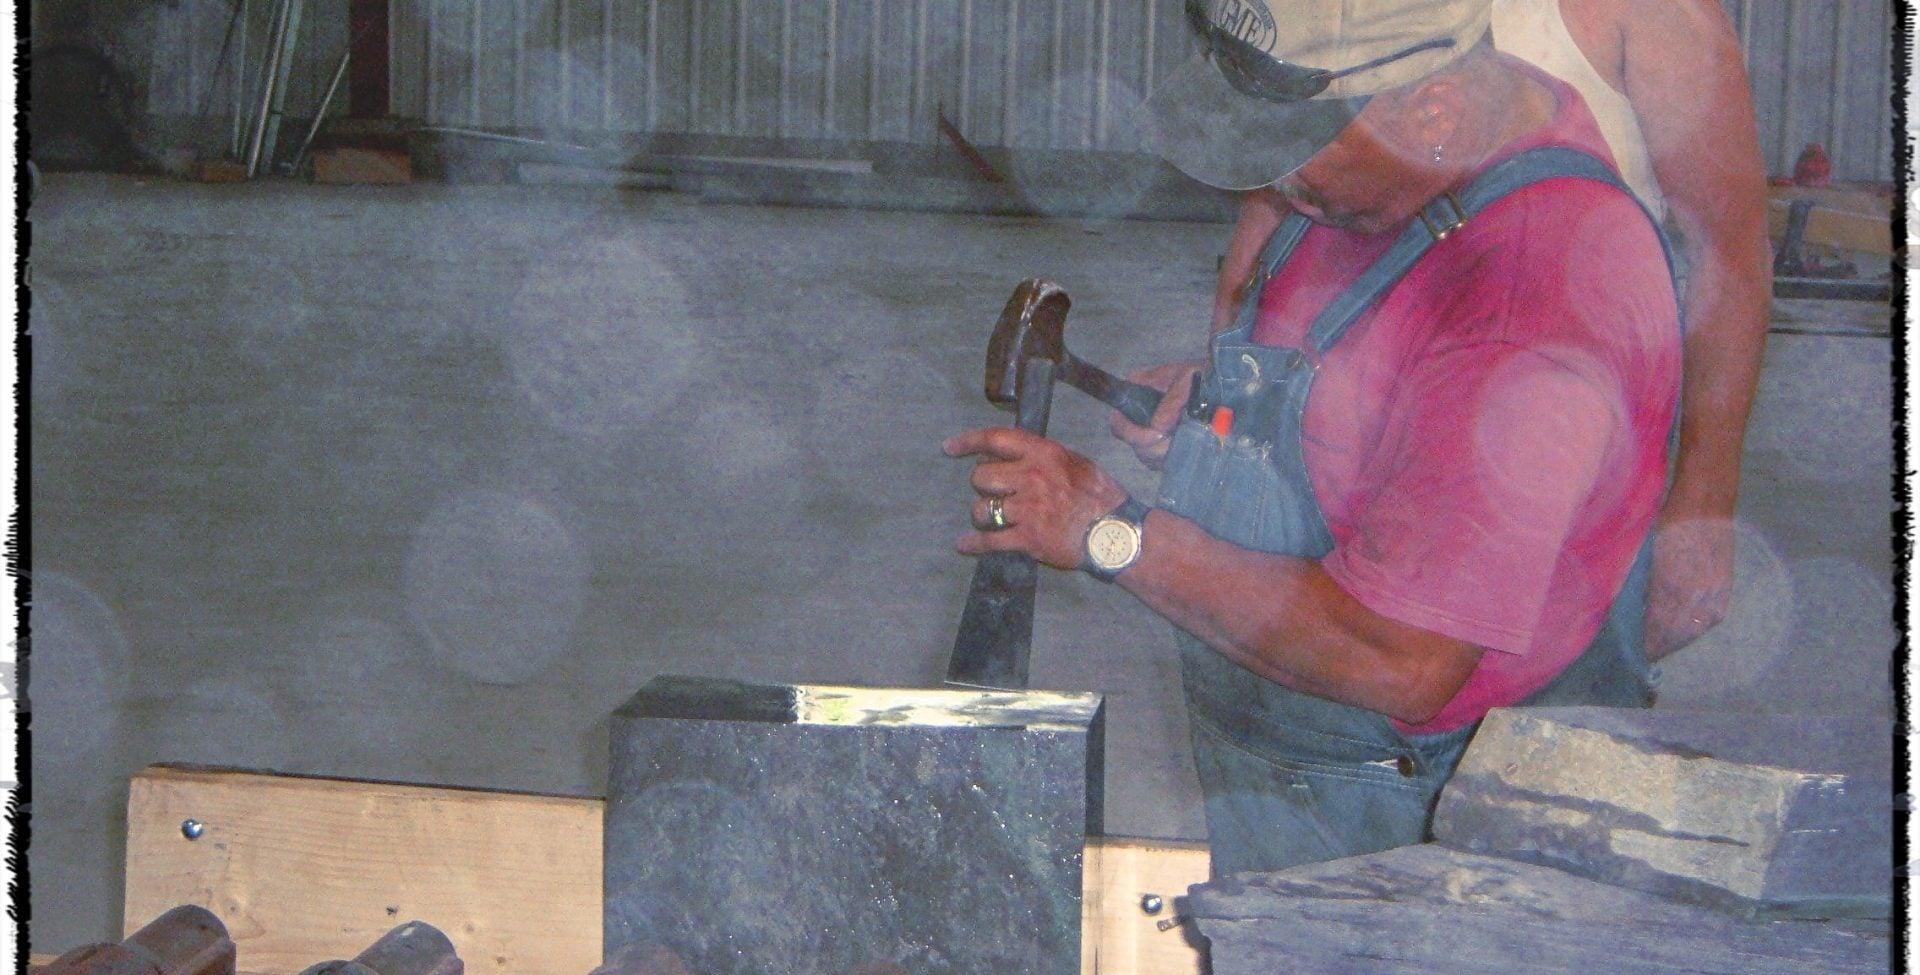 Slate worker splitting roofing slate.